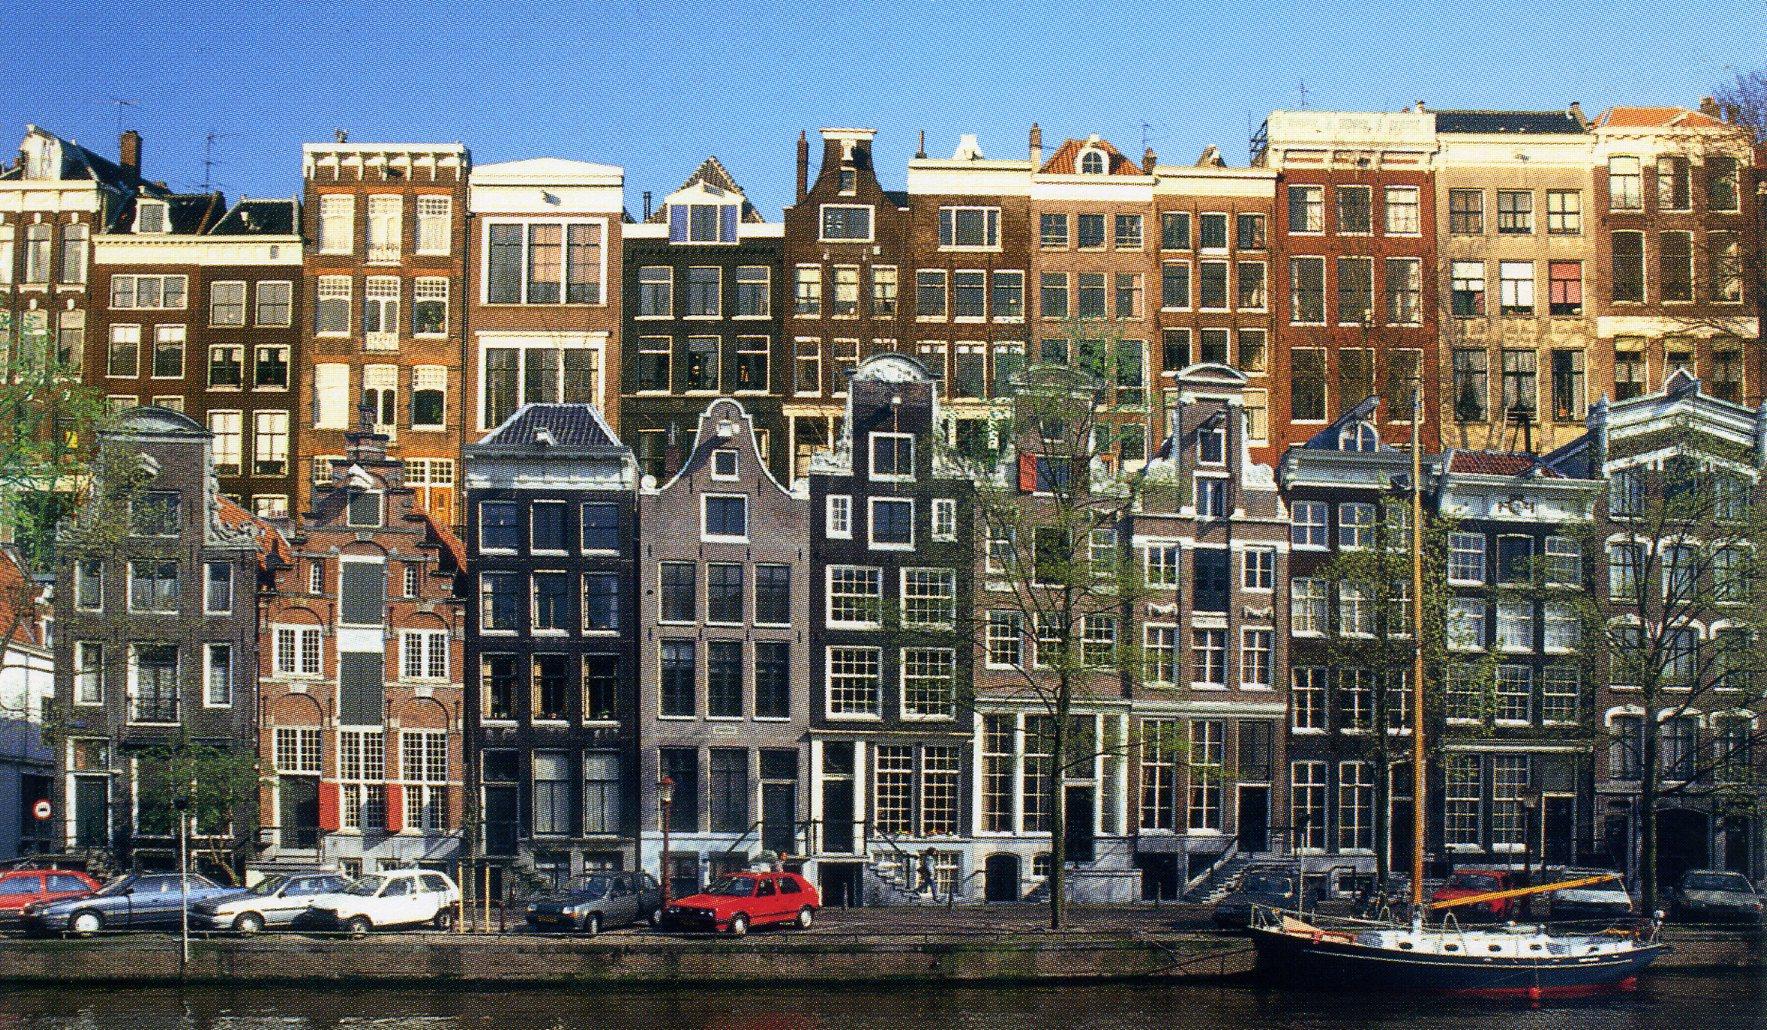 Europa.Paesi Bassi.Amsterdam copia